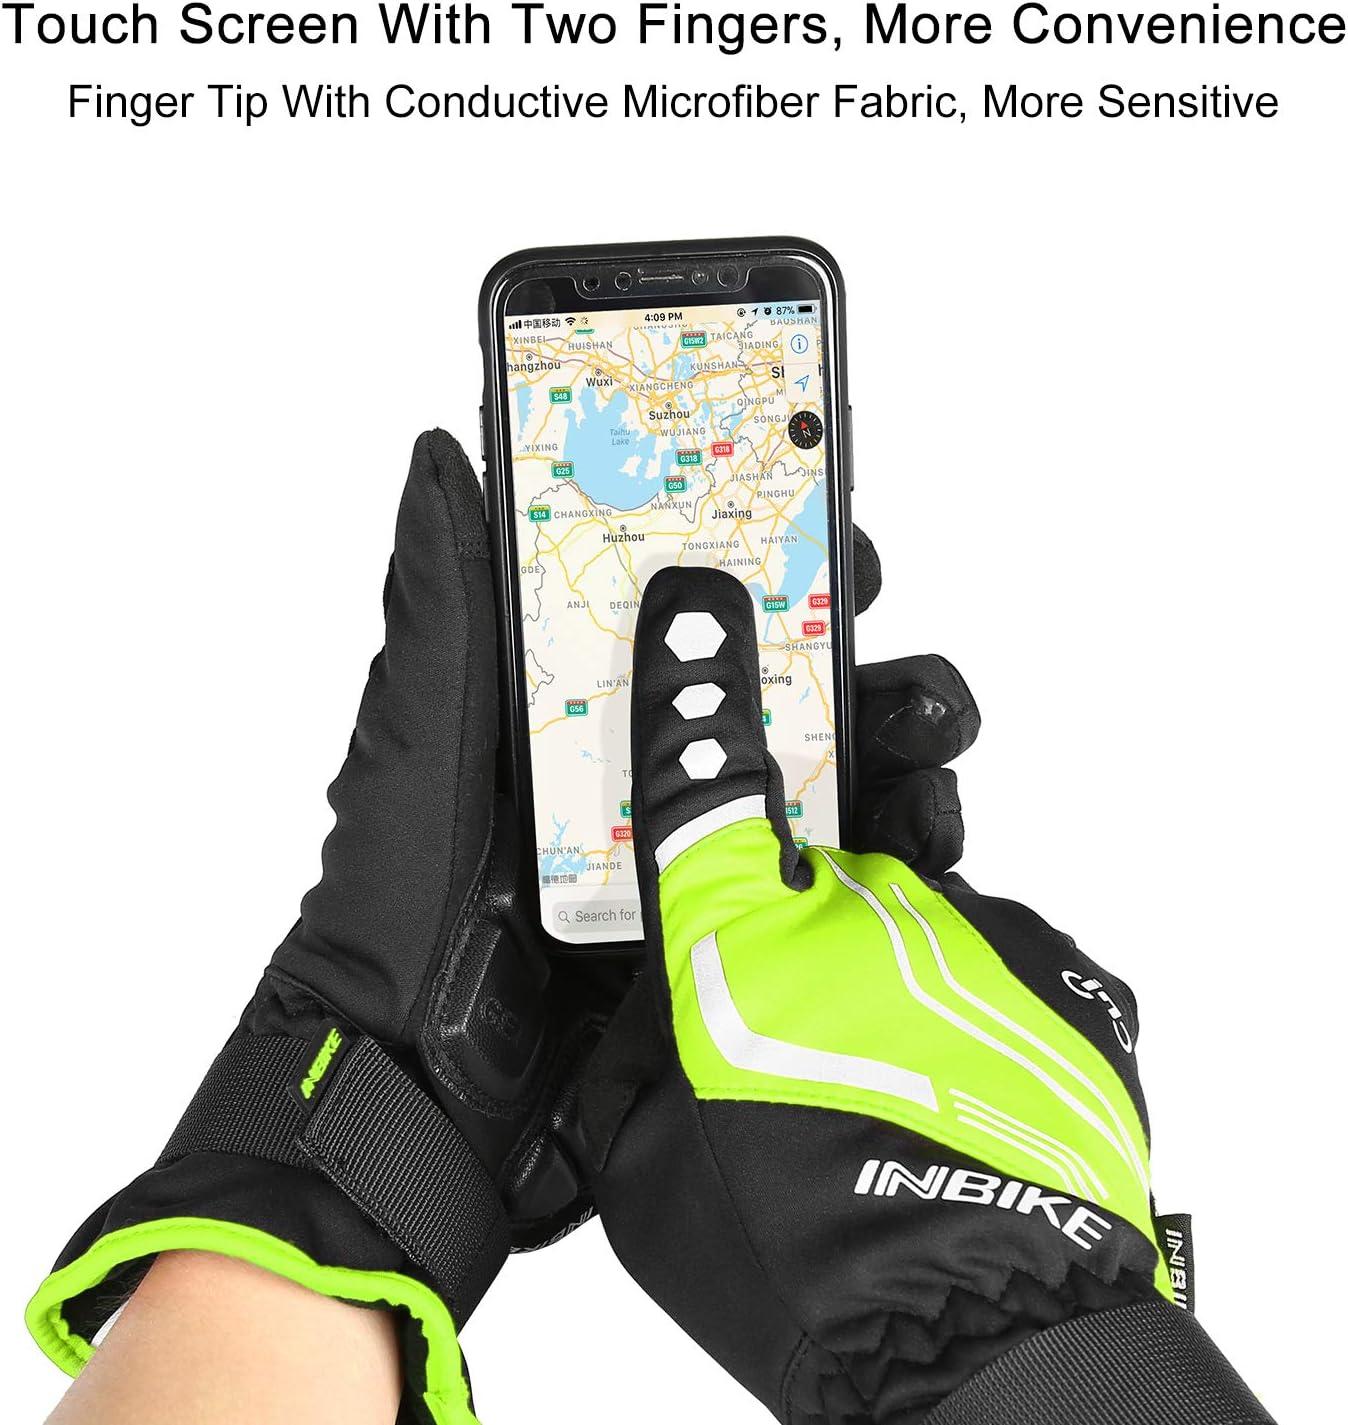 969R AislamientoT/érmico y Forro Polar INBIKE Guantes Ciclismo Hombre para Invierno Guantes De Pantalla T/áctil para Bicicleta Carretera MTB con Membrana Impermeable